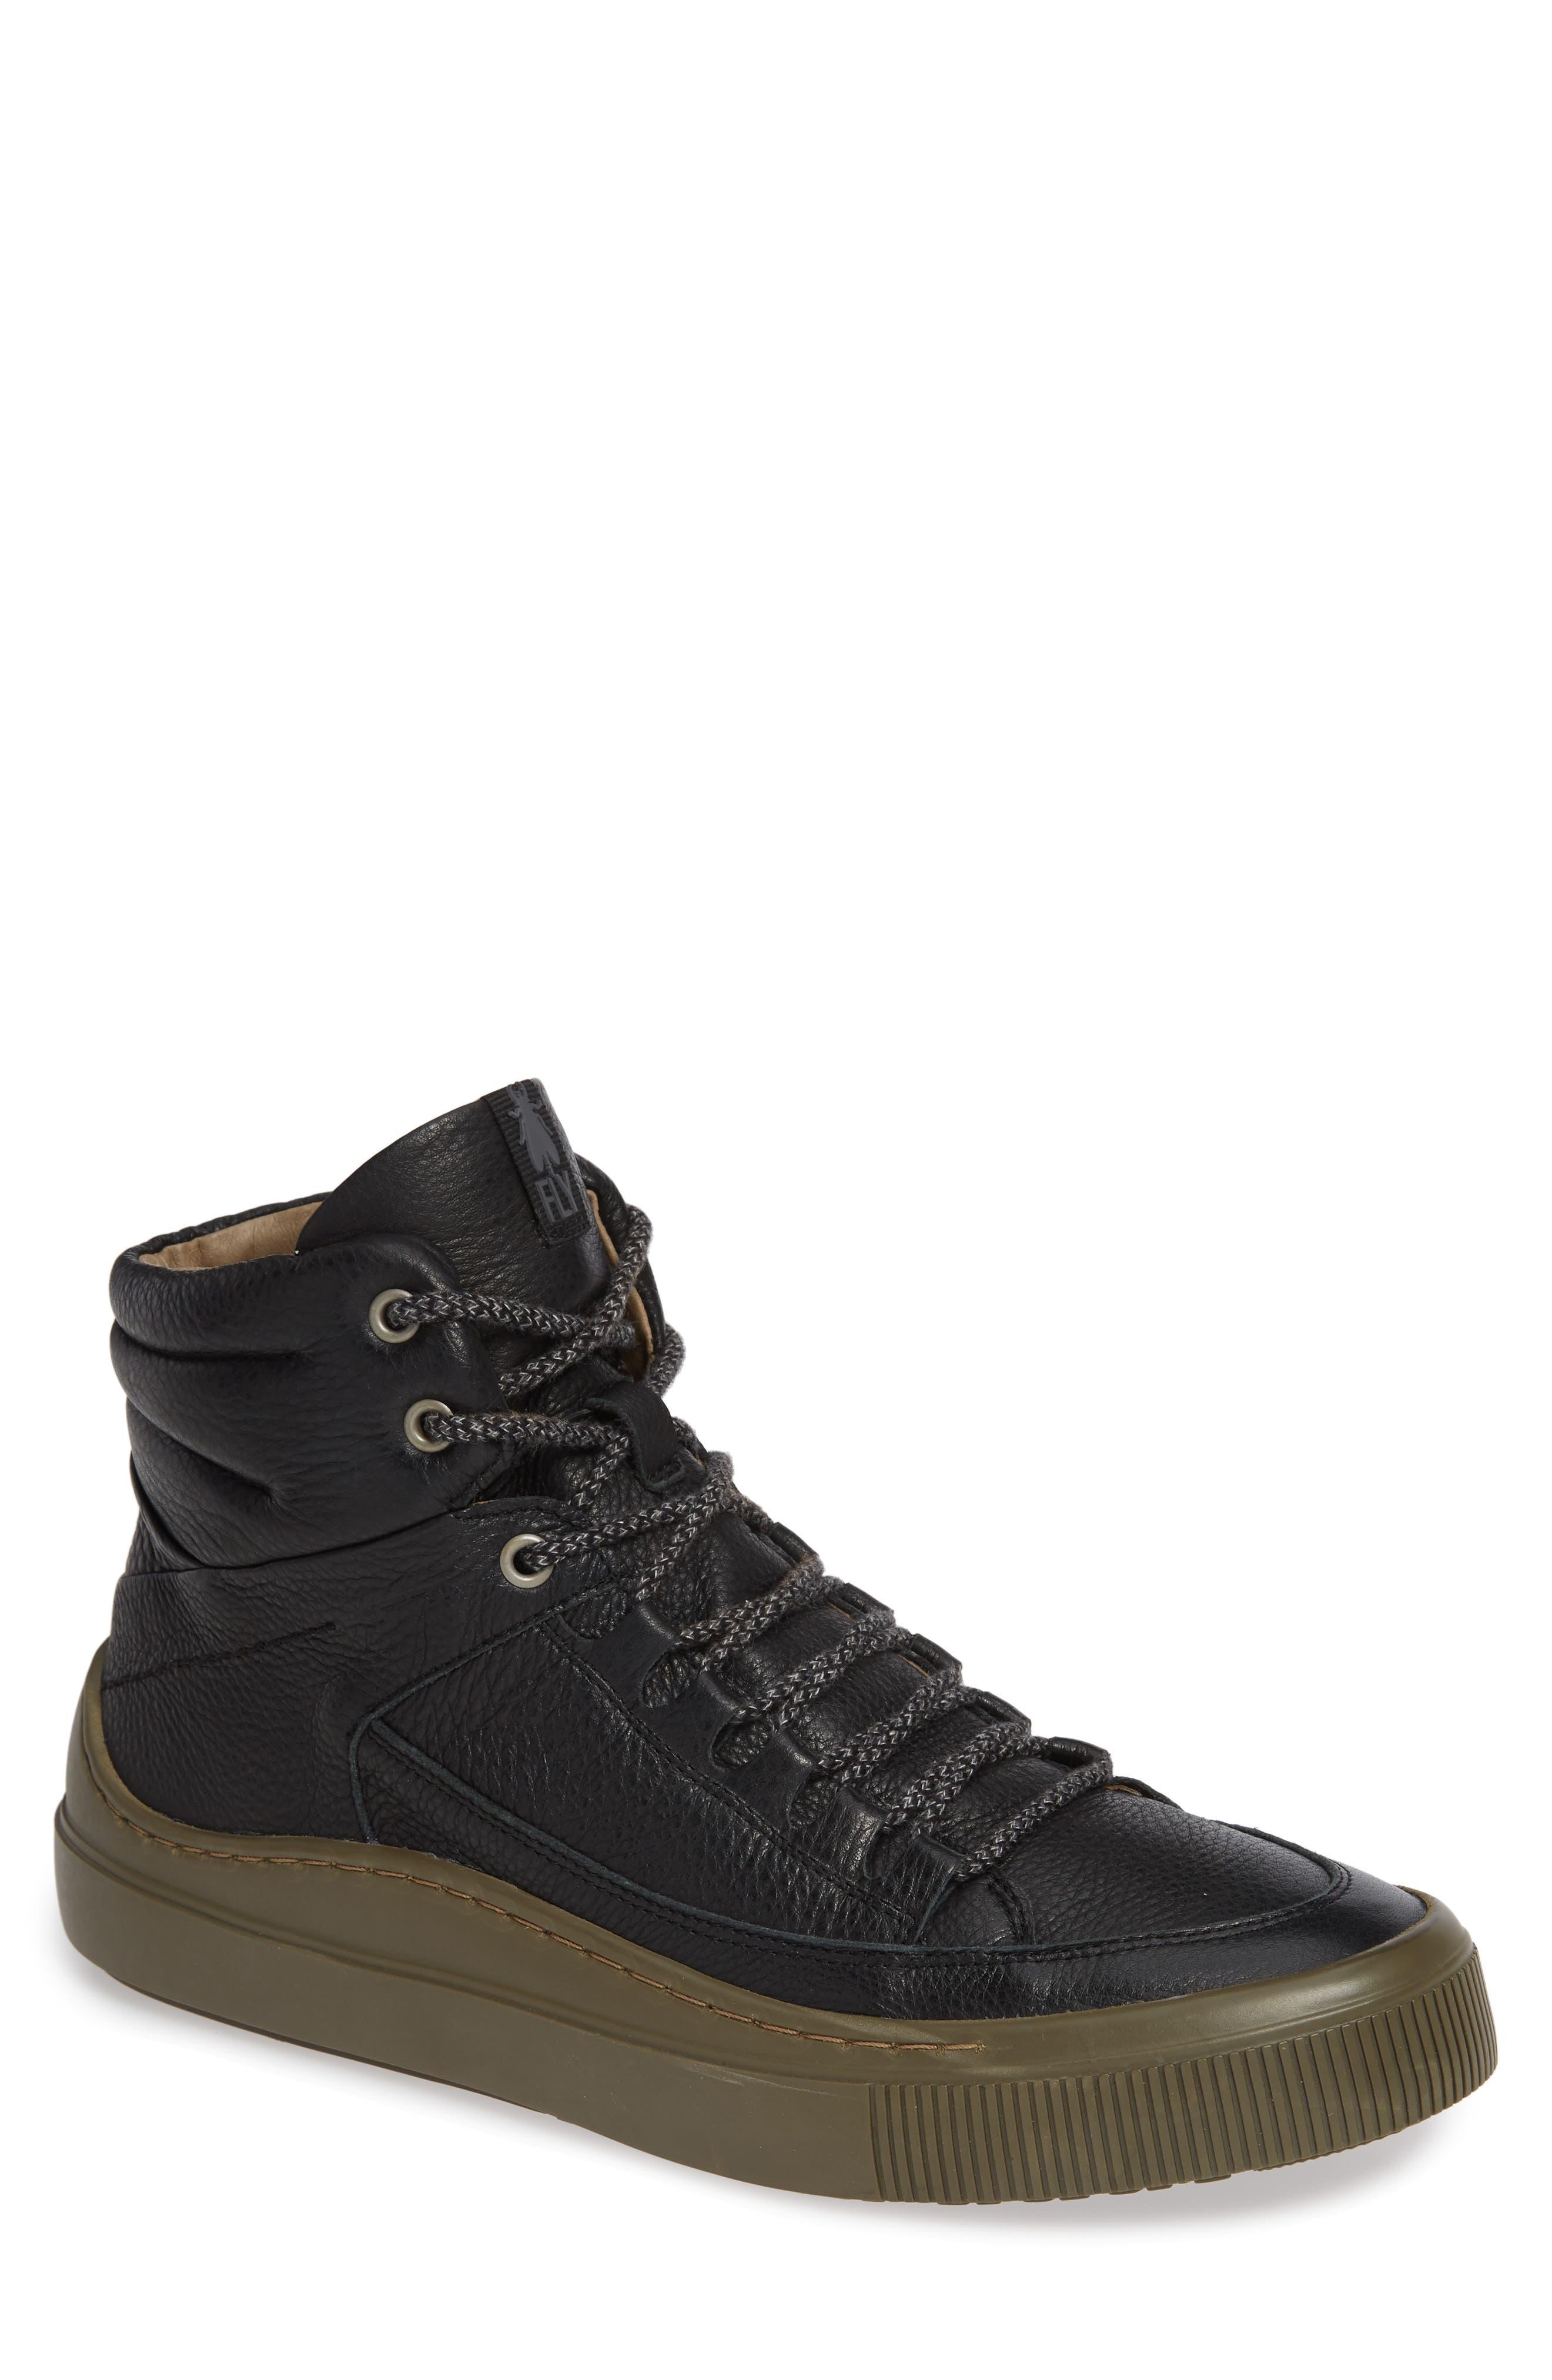 Samu Sneaker,                             Main thumbnail 1, color,                             BLACK/ NICOTINE BRITO